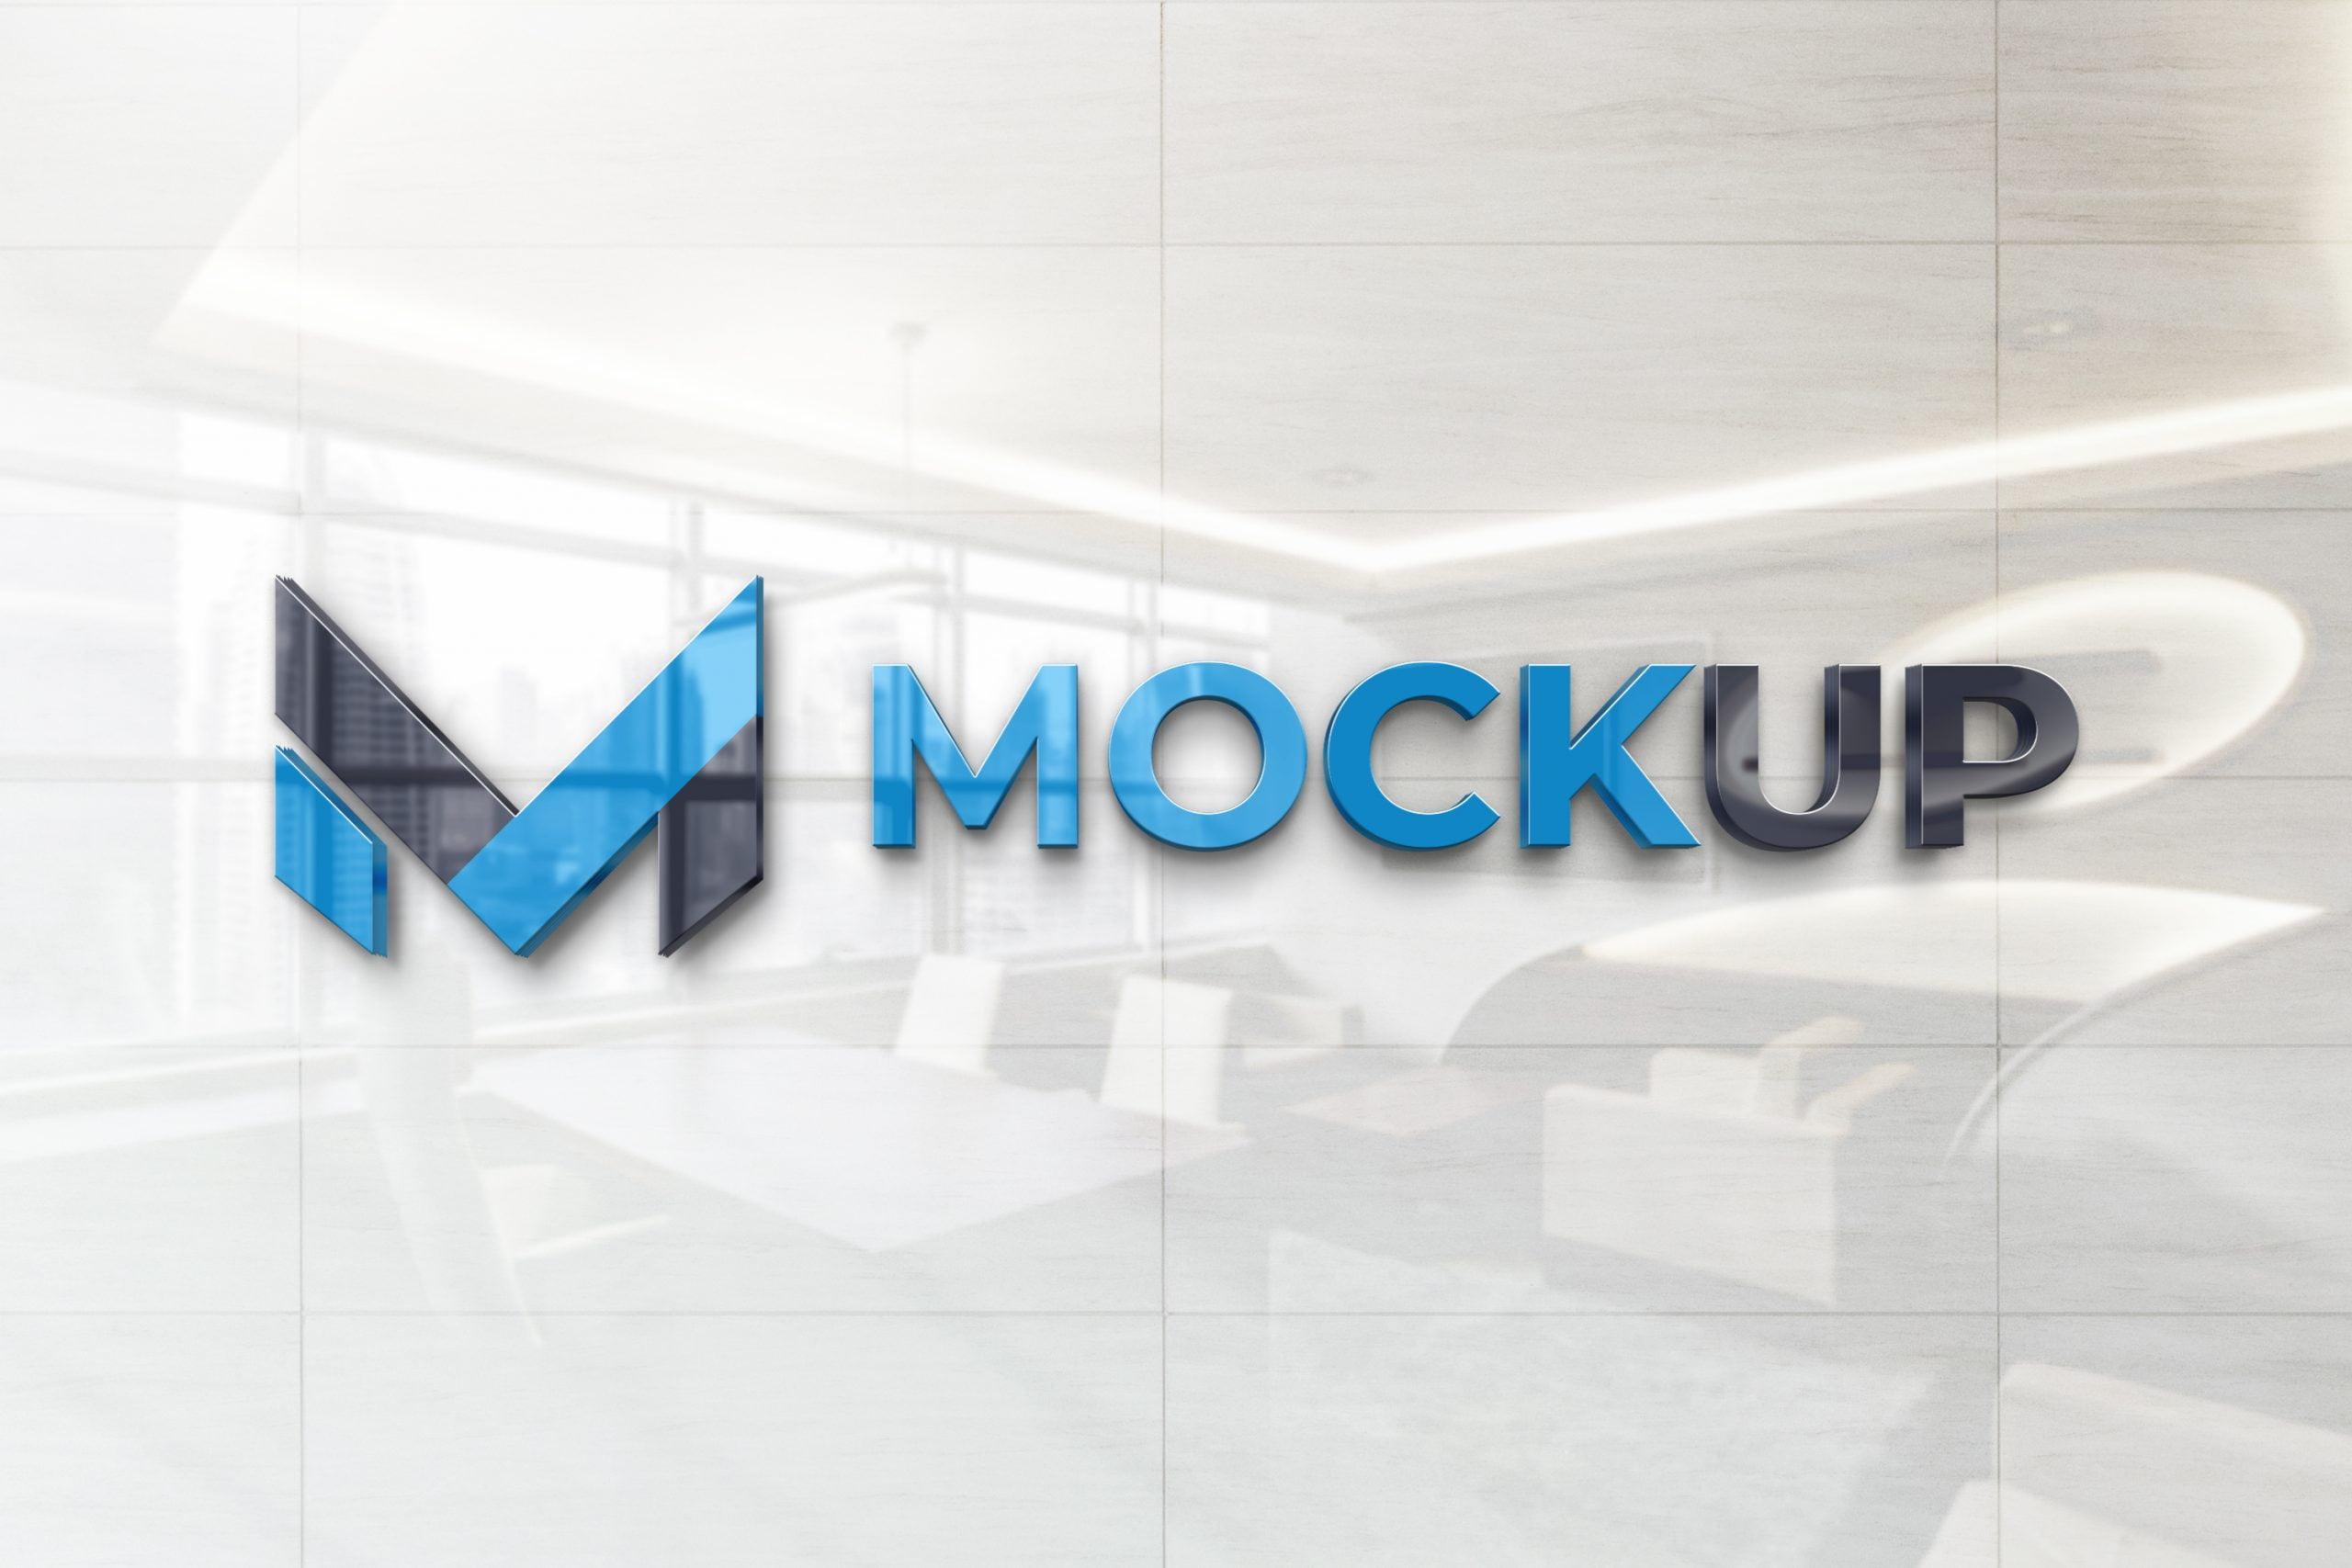 Glossy Wall Logo Mockup - By Designer Hamza